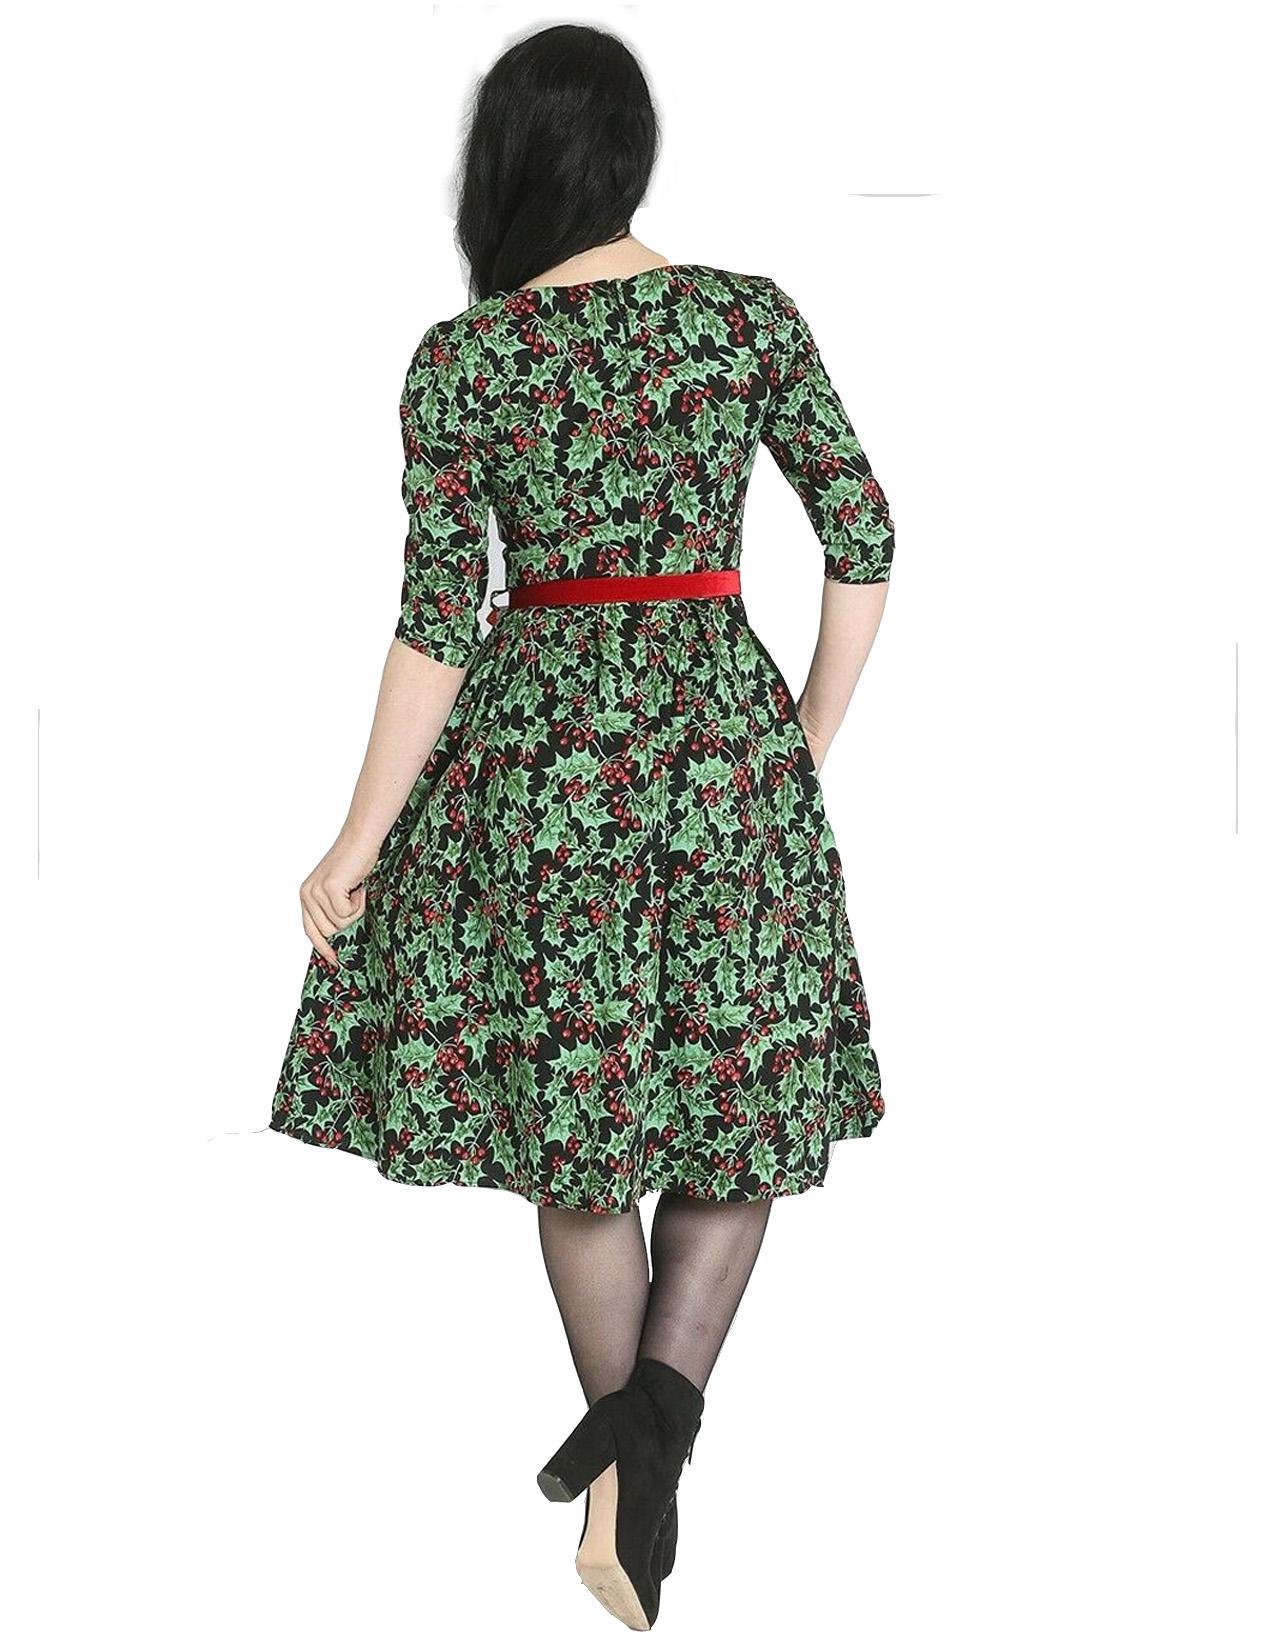 Hell-Bunny-50s-Pin-Up-Navidad-Vestido-Festivo-Rojo-Holly-Berry-Negro-Todos-los-Tamanos miniatura 13